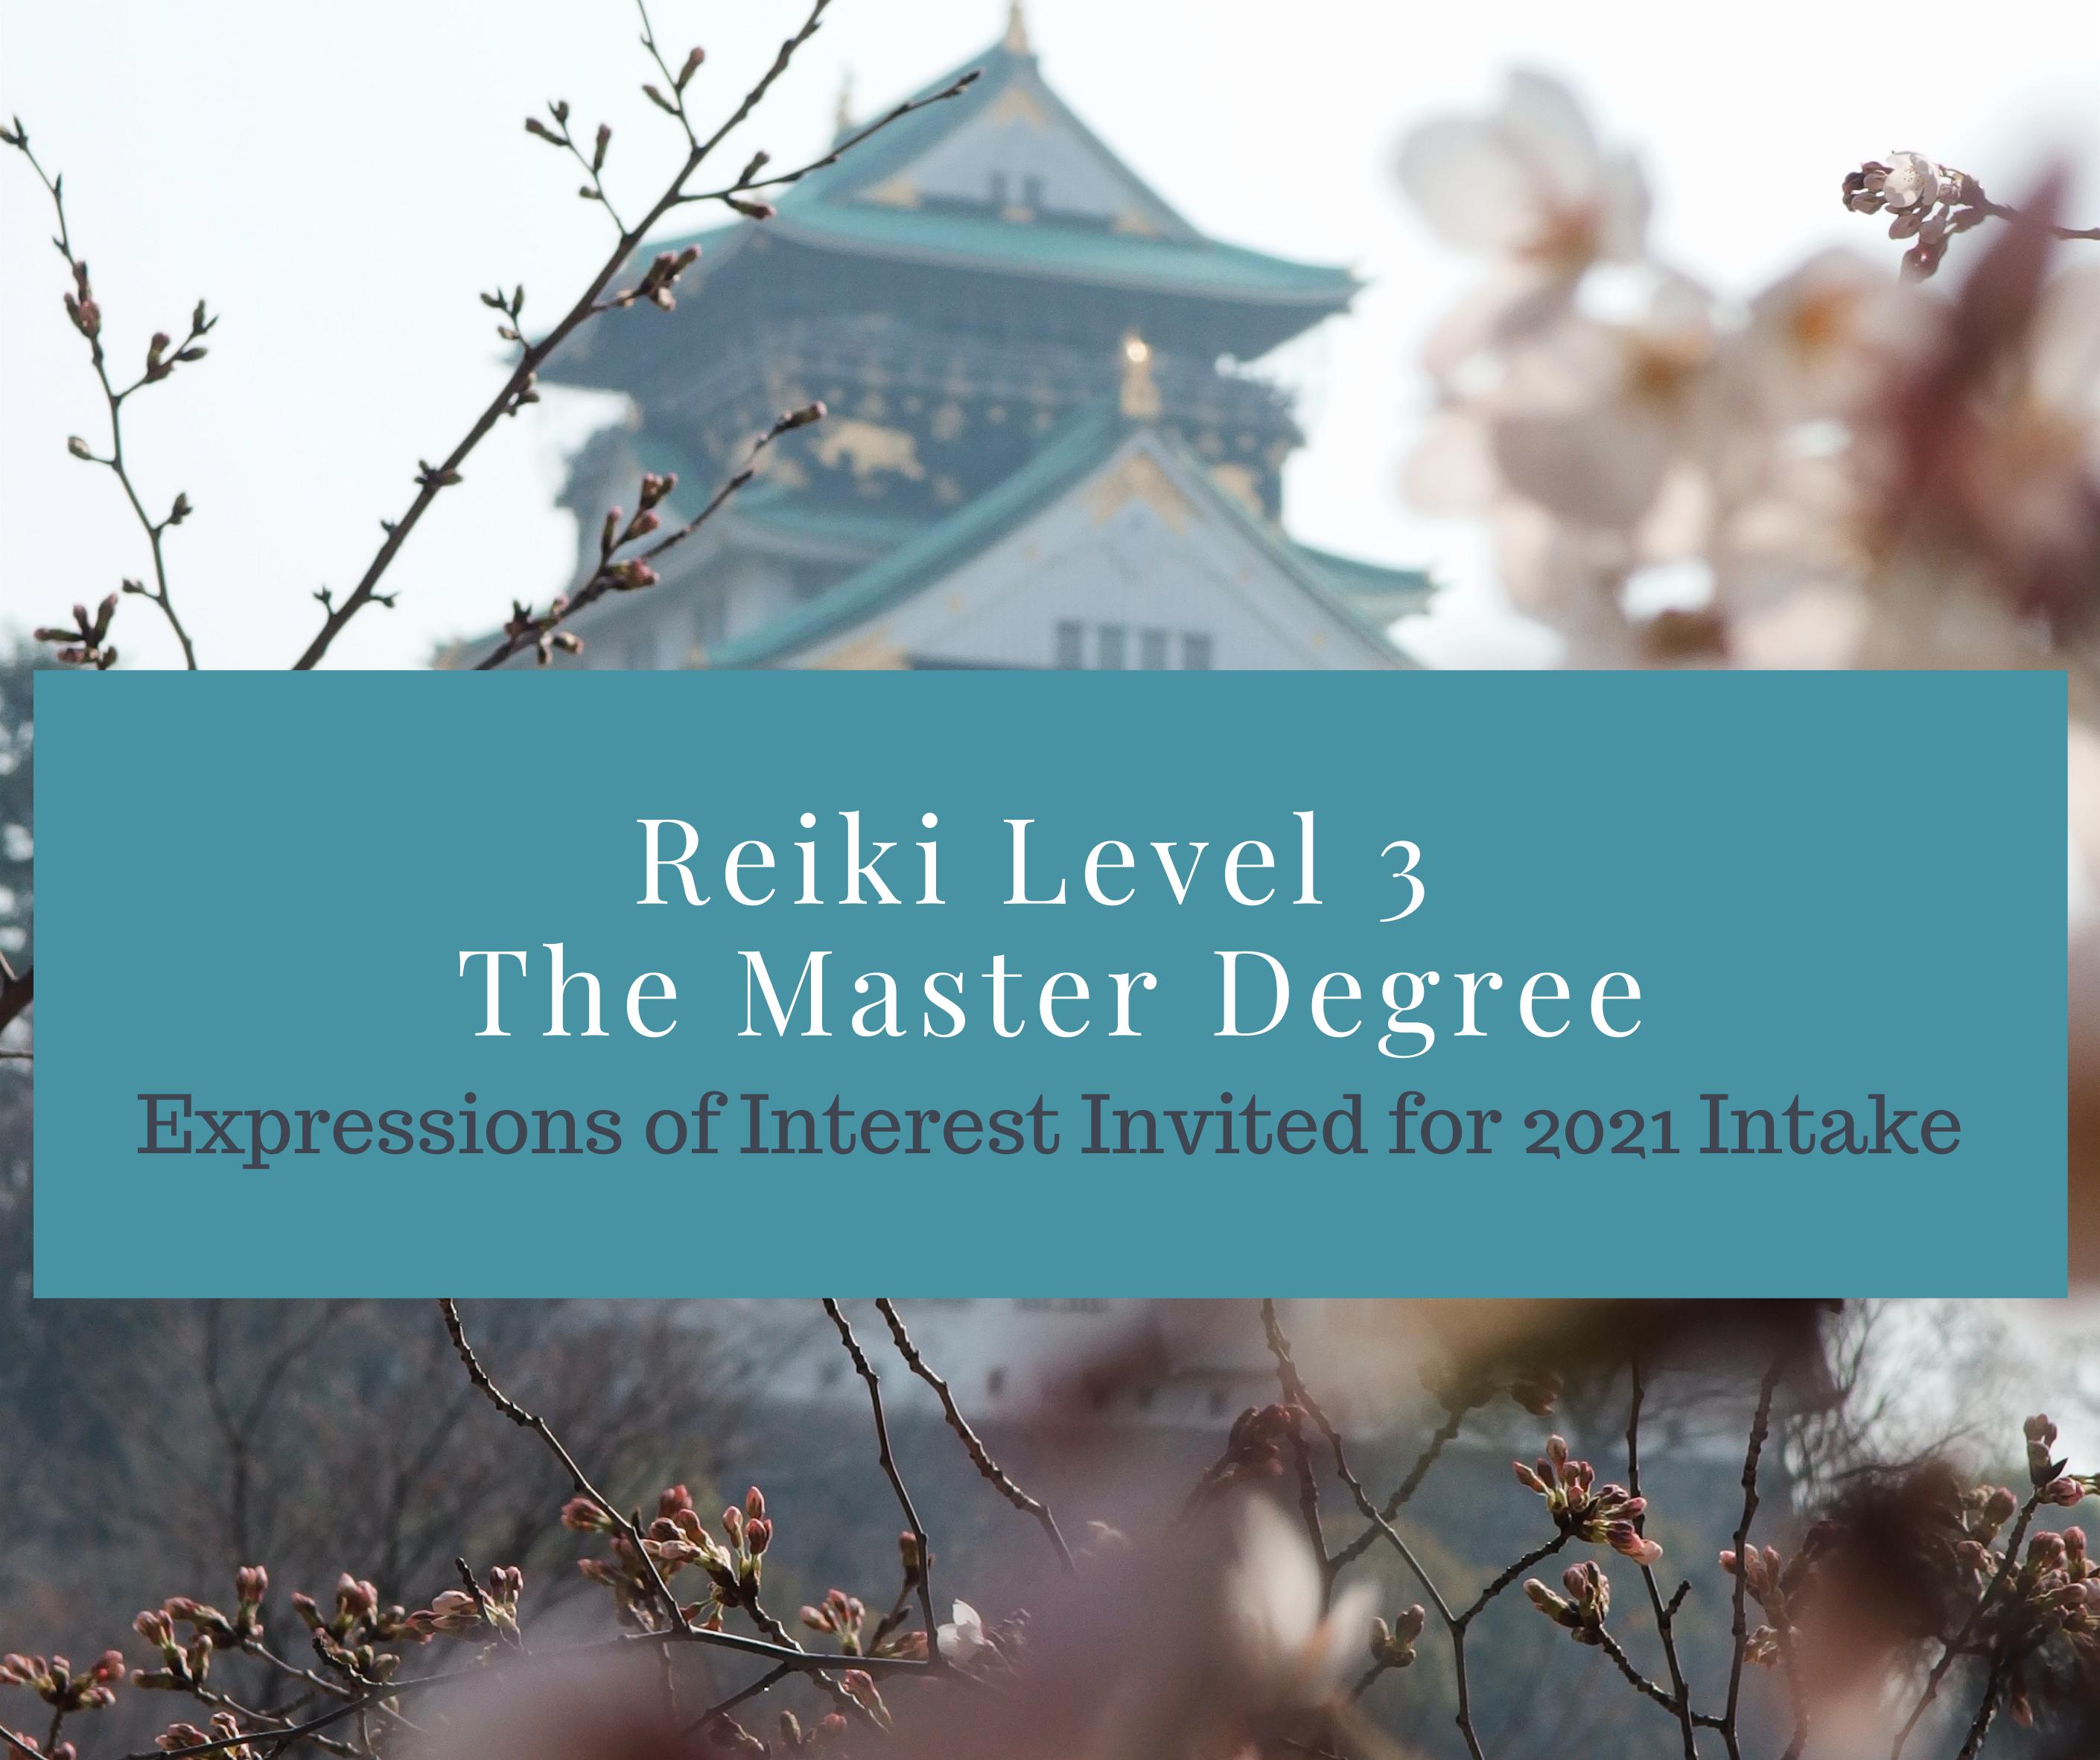 Reiki Level 3 - The Master Degree